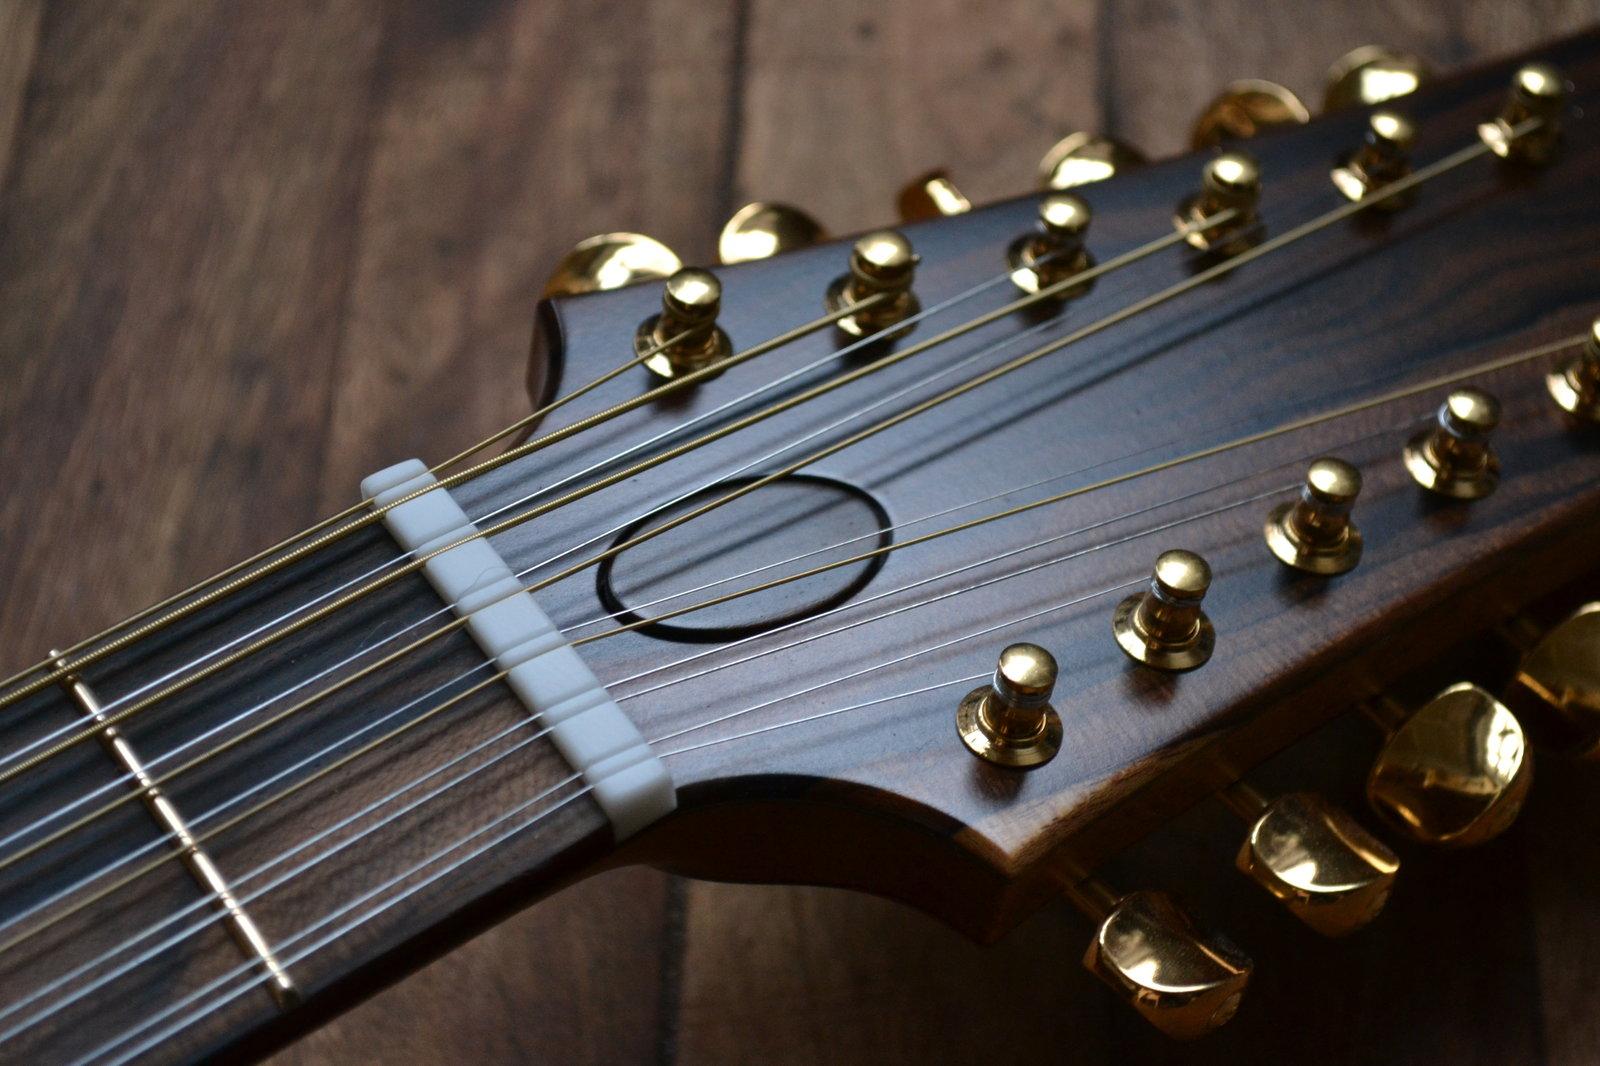 Guitare Baron 12 cordes (fabrication en cours) - Page 2 191212024210370123